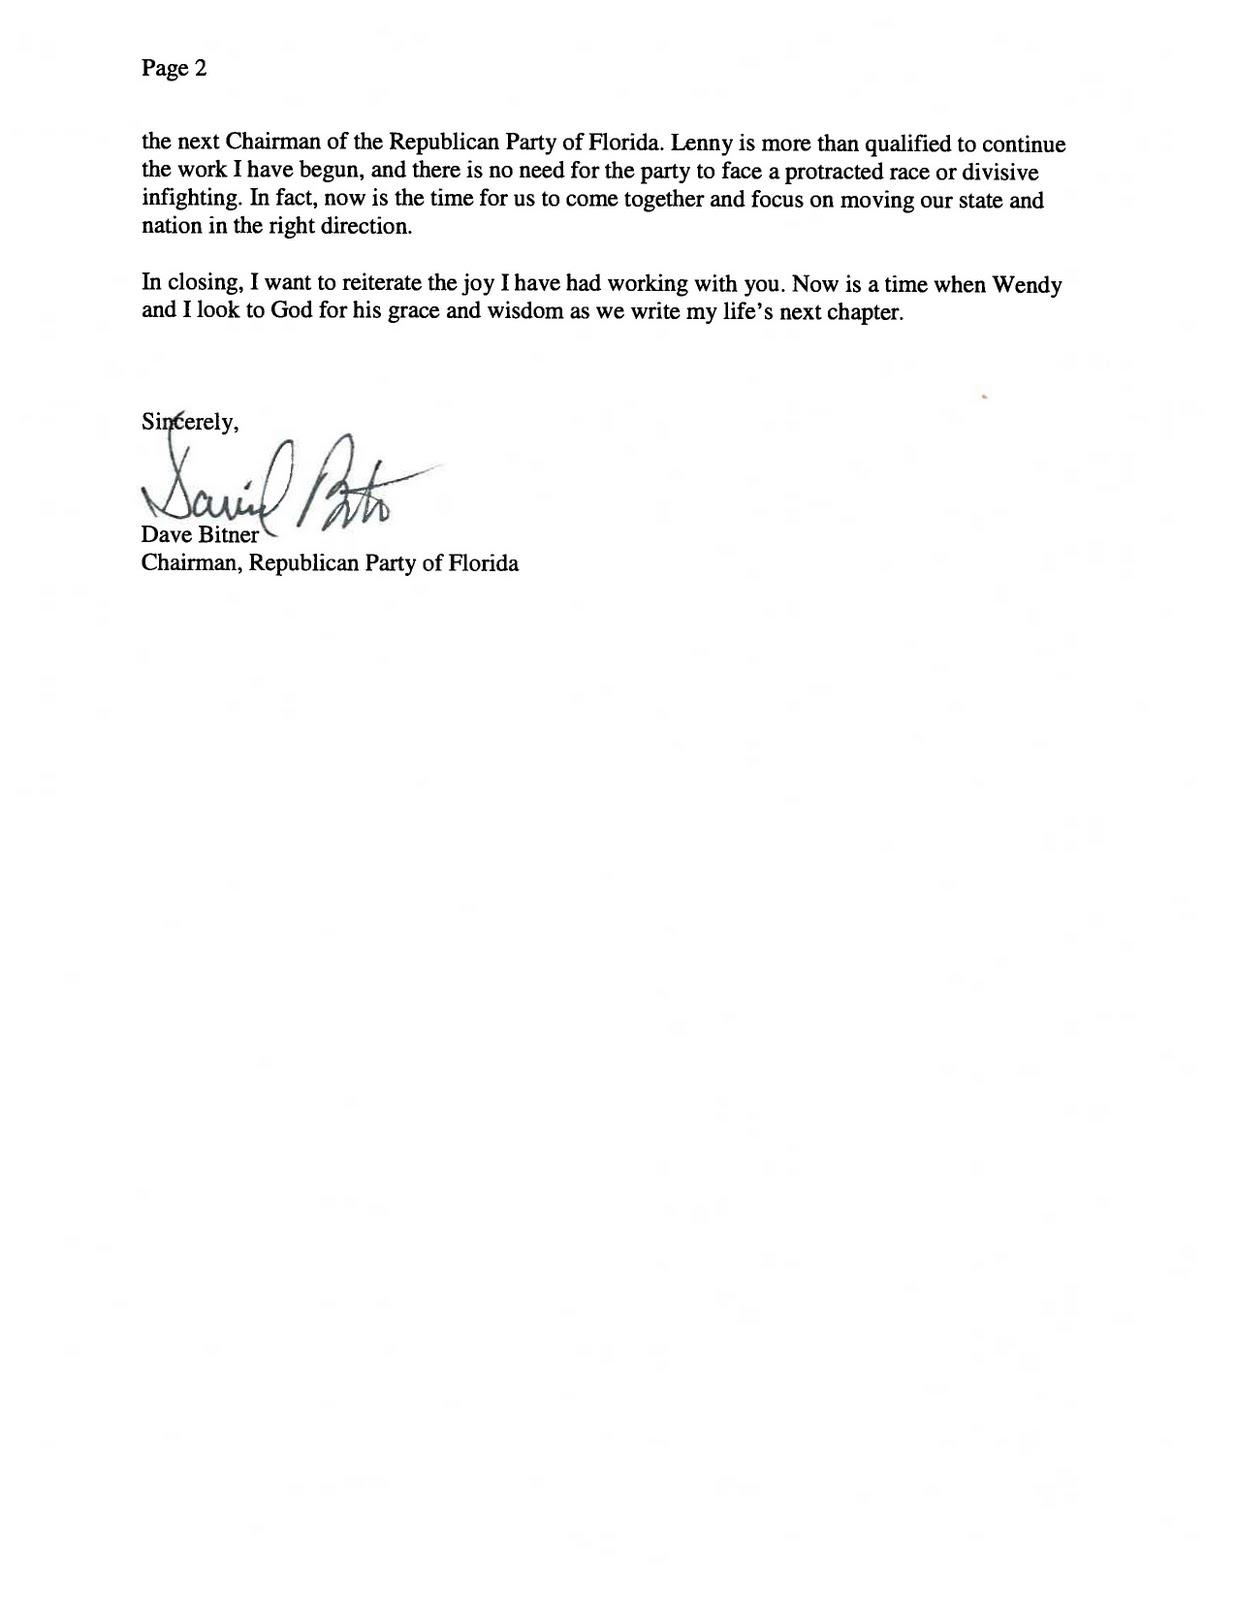 resignation letter email resignation letter email 4337